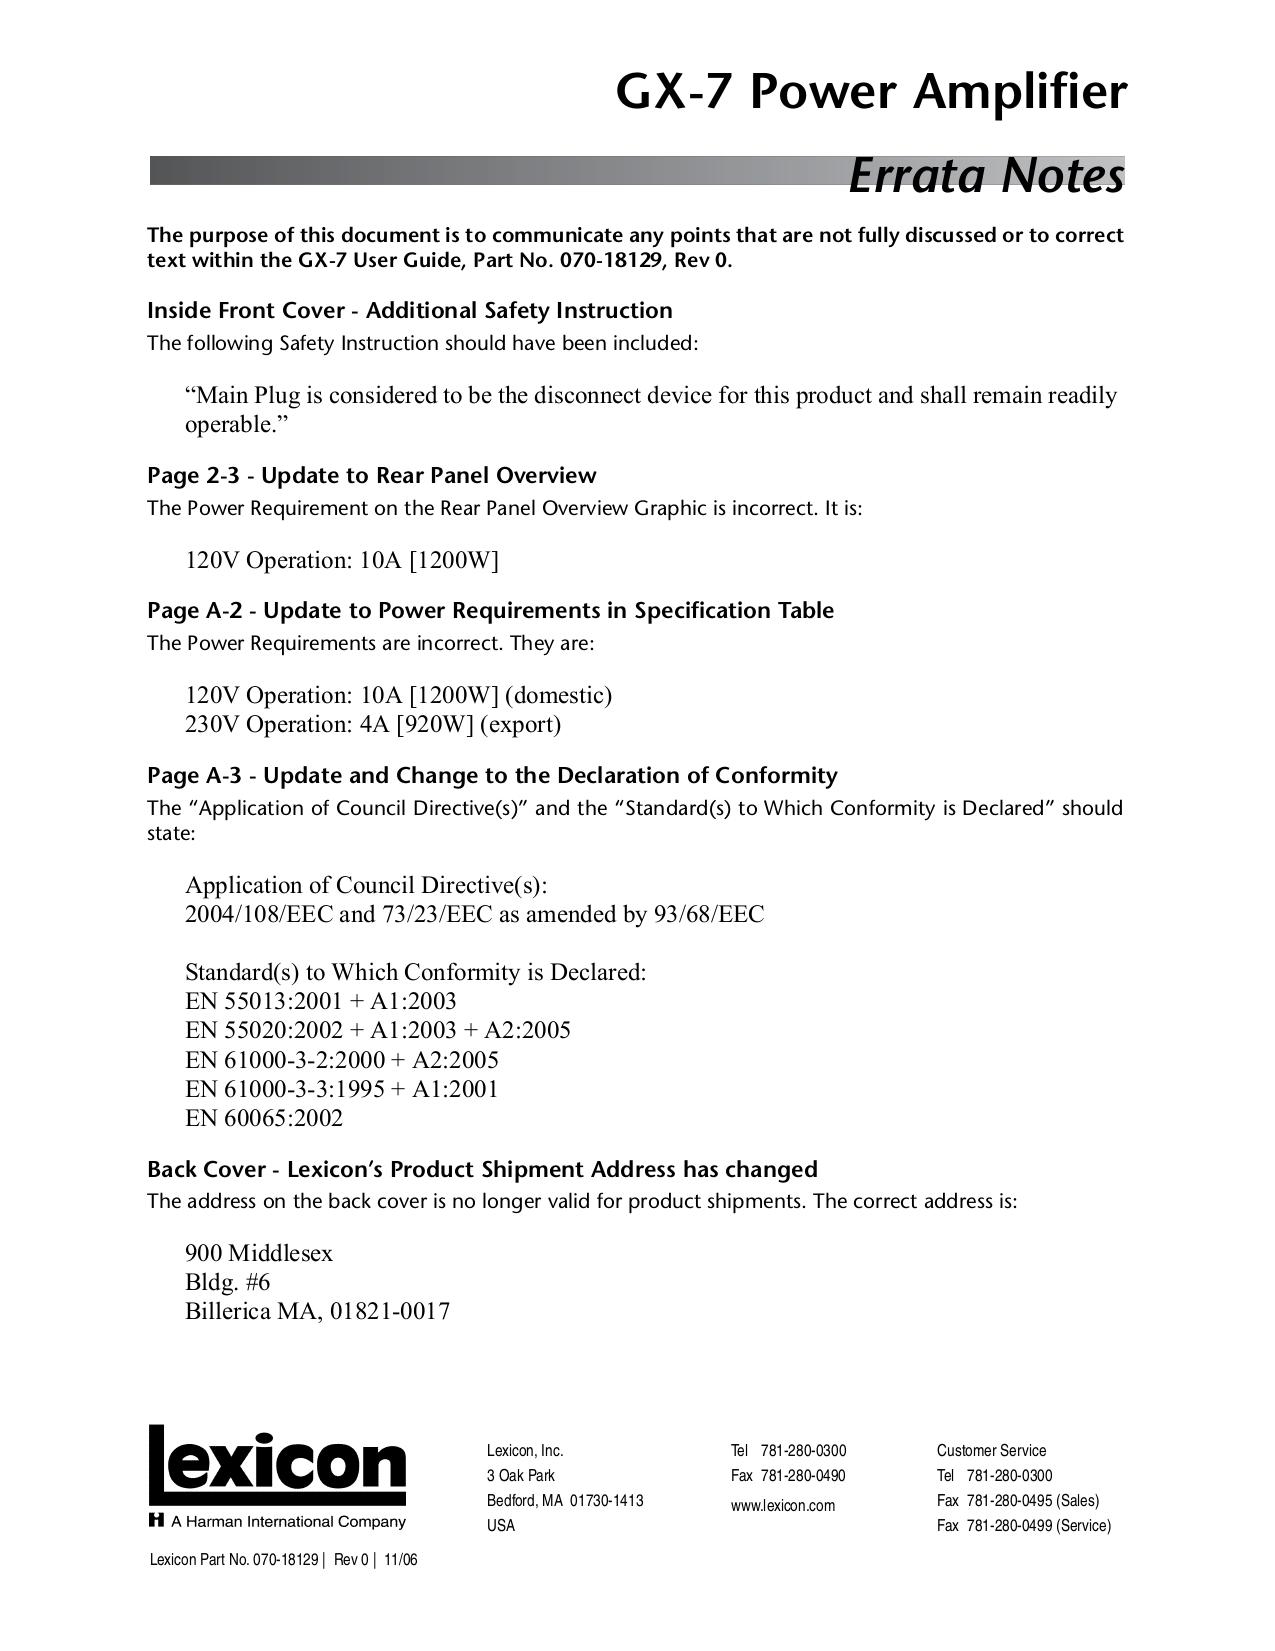 pdf for Lexicon Amp GX-7 manual